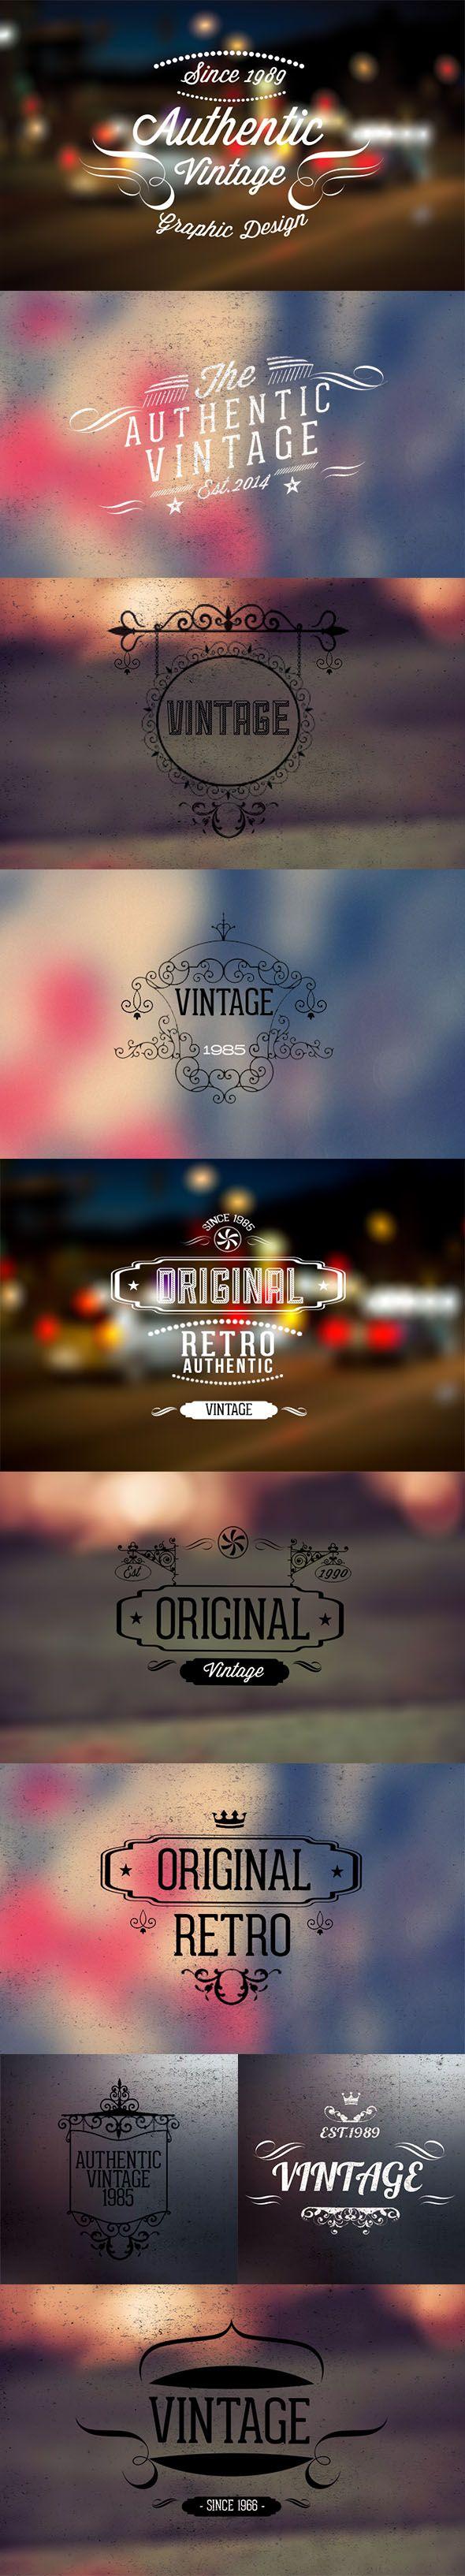 10 Vintage retro labels PSD file V2 free Version by kadayoub